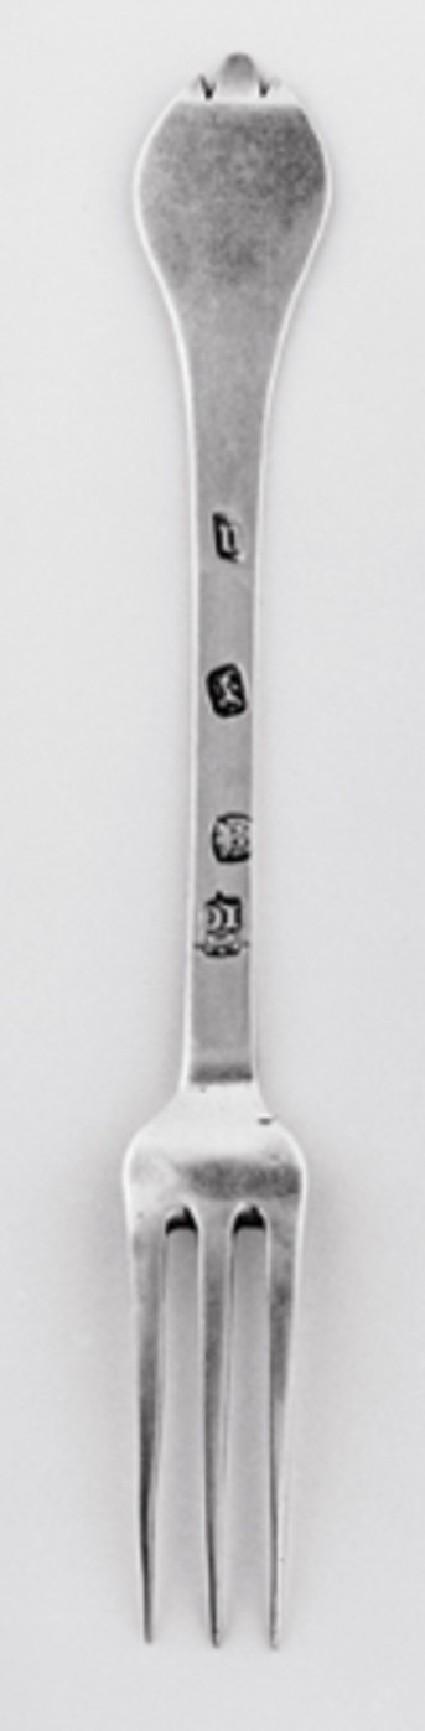 Three-pronged fork